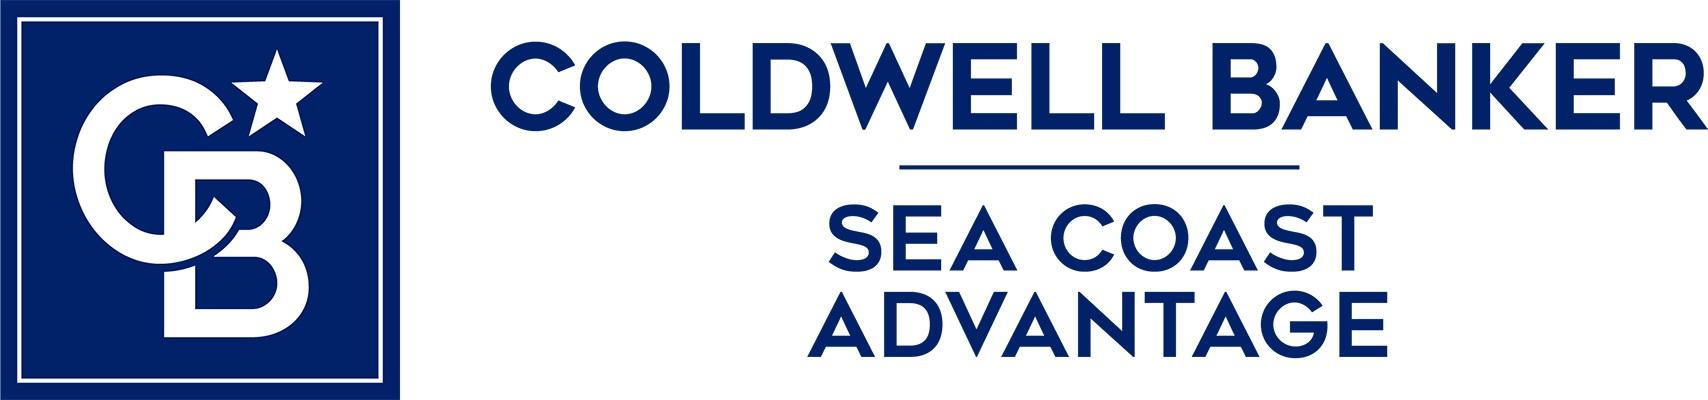 Nick Newell - Coldwell Banker Sea Coast Advantage Realty Logo